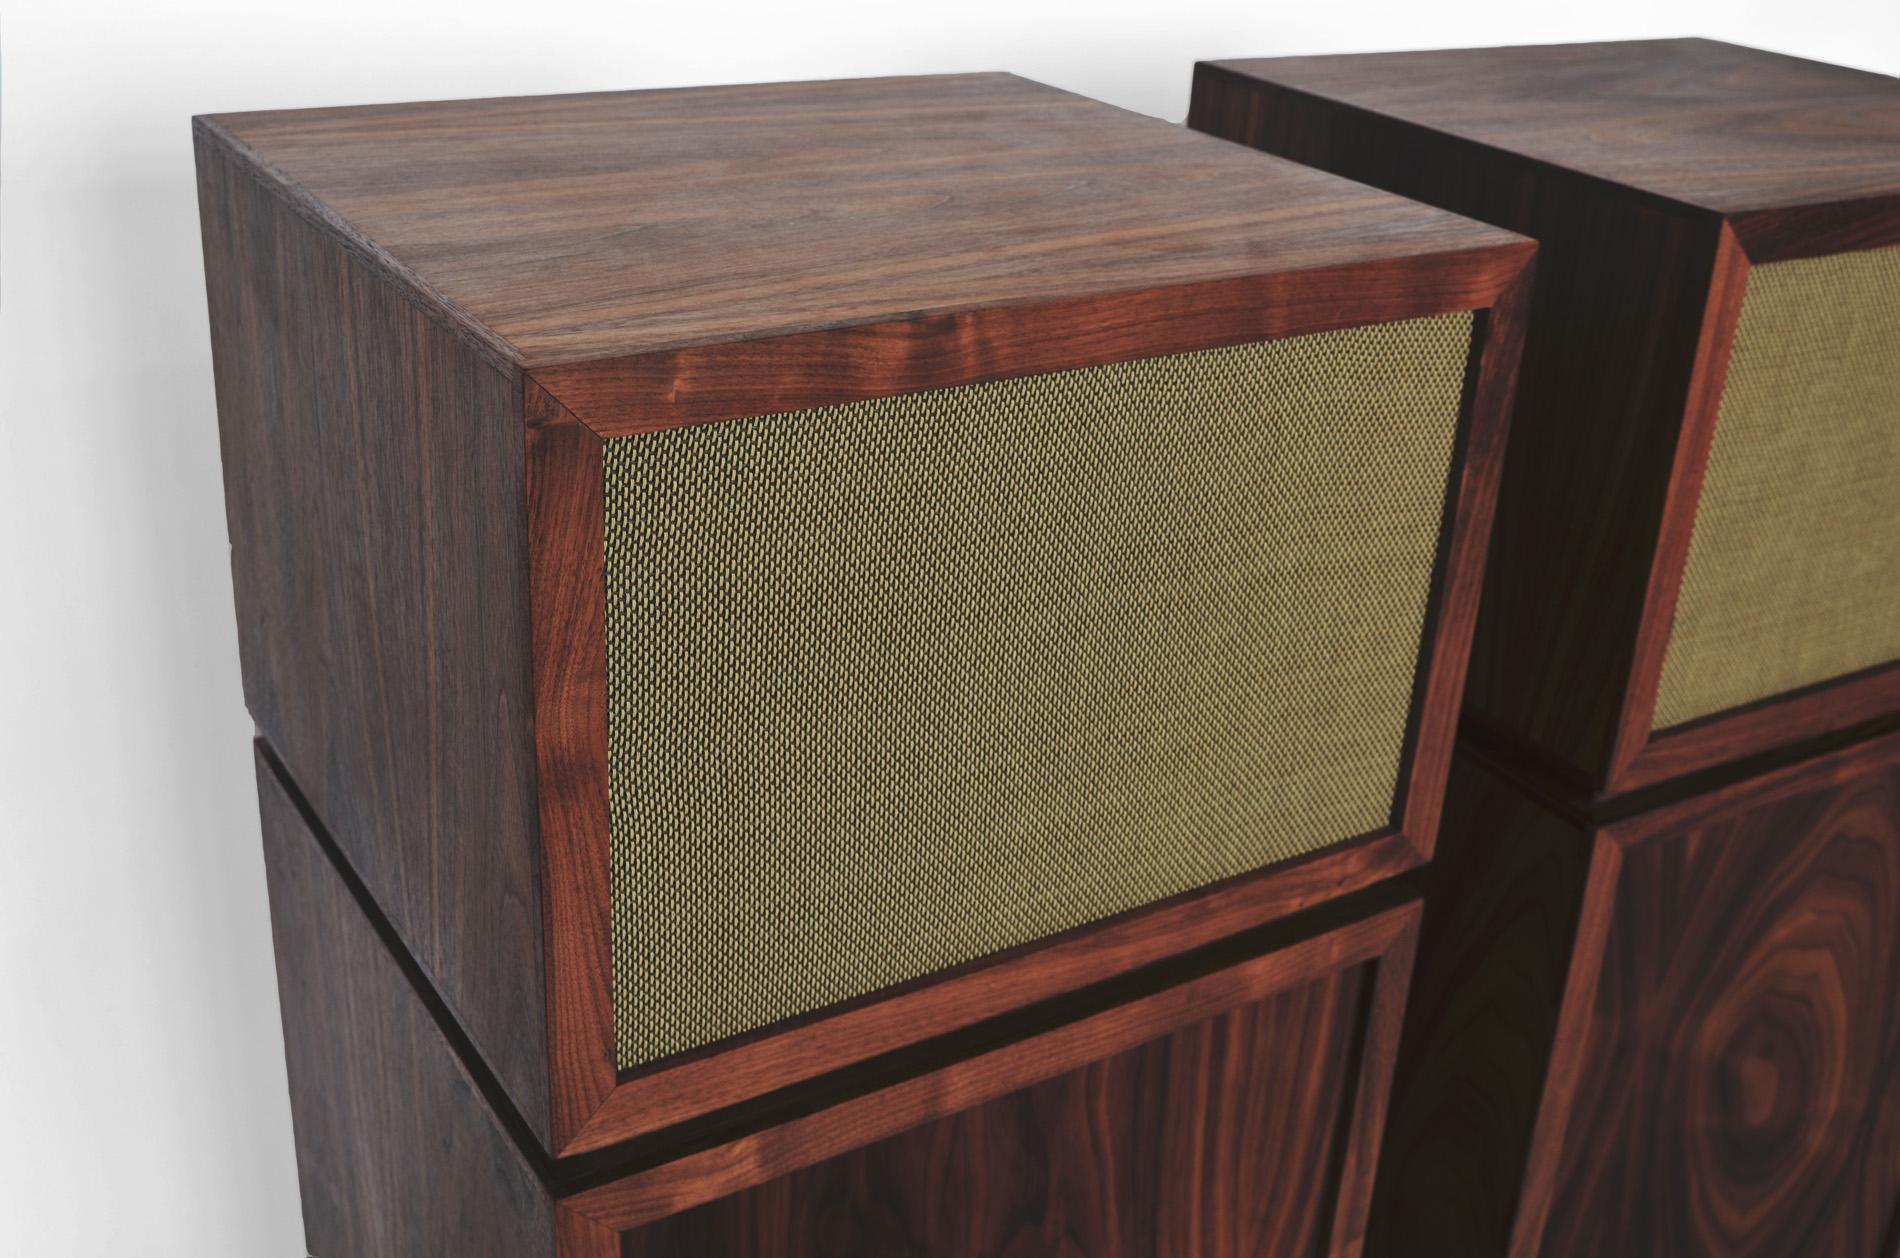 speaker_stands3.jpg